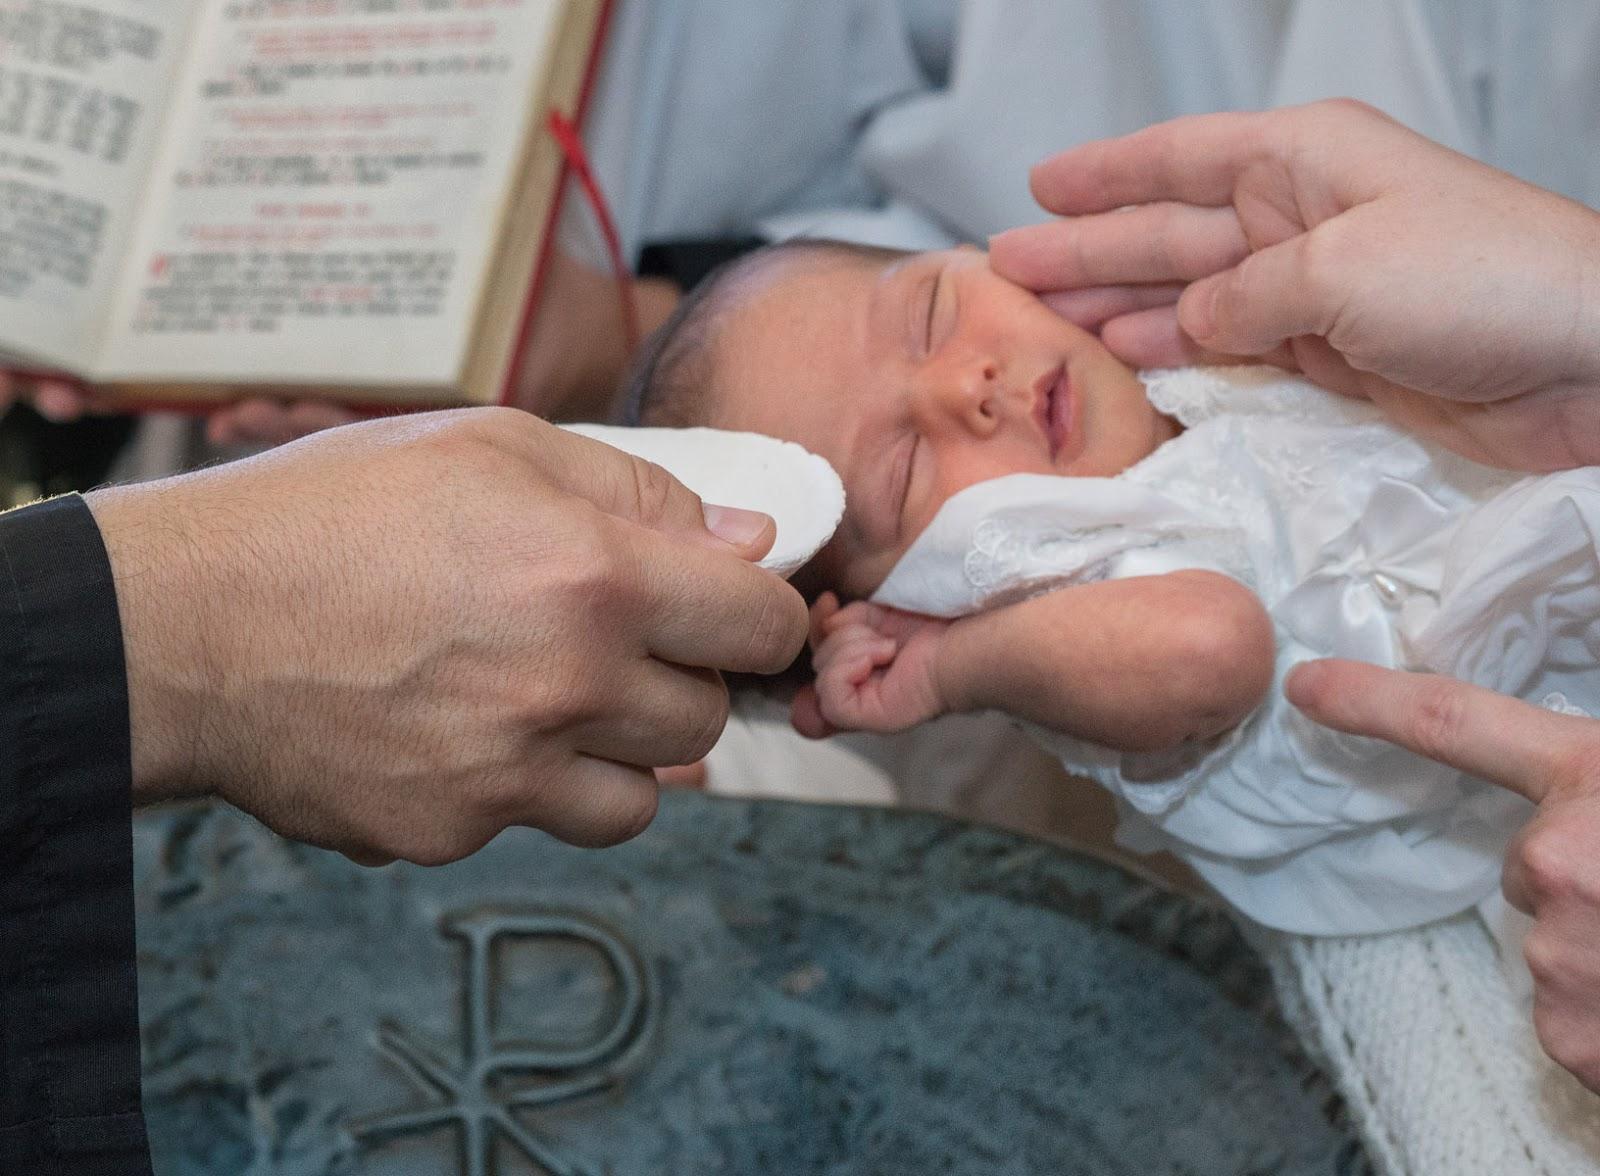 7 Baby Toddler White Lady Guadalupe Roses Christening Baptism Stole Newborn